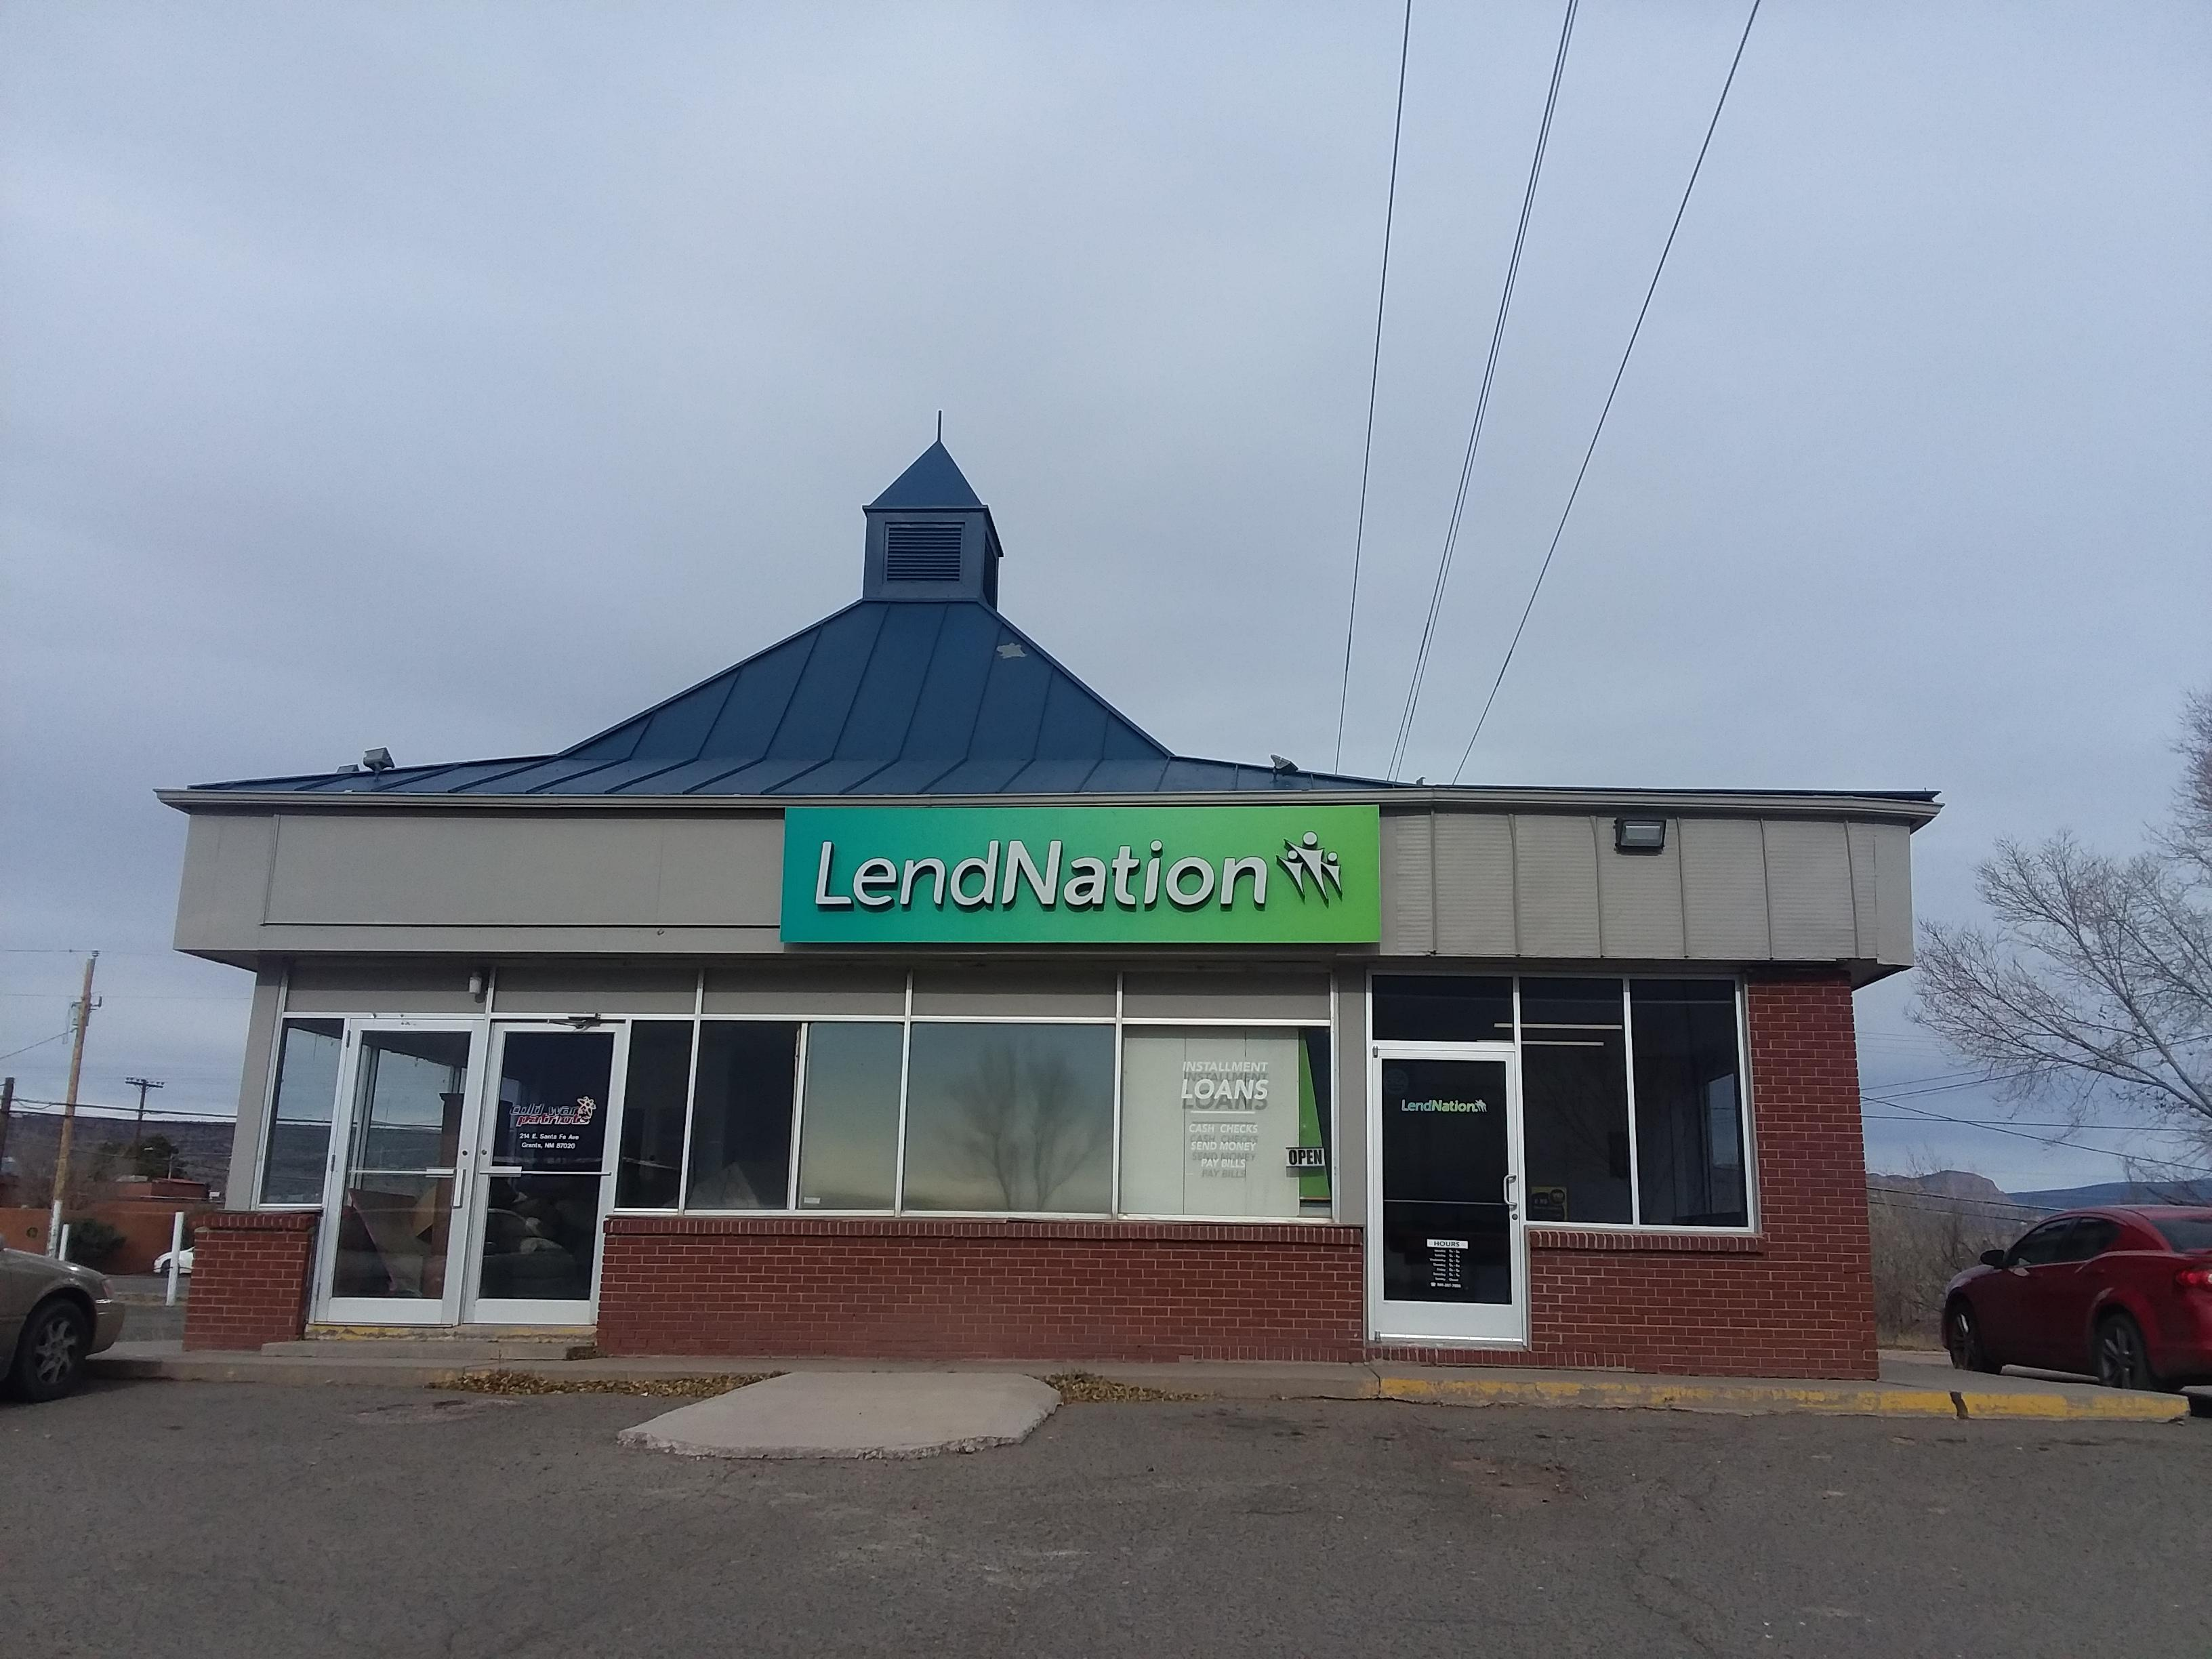 LendNation image 3